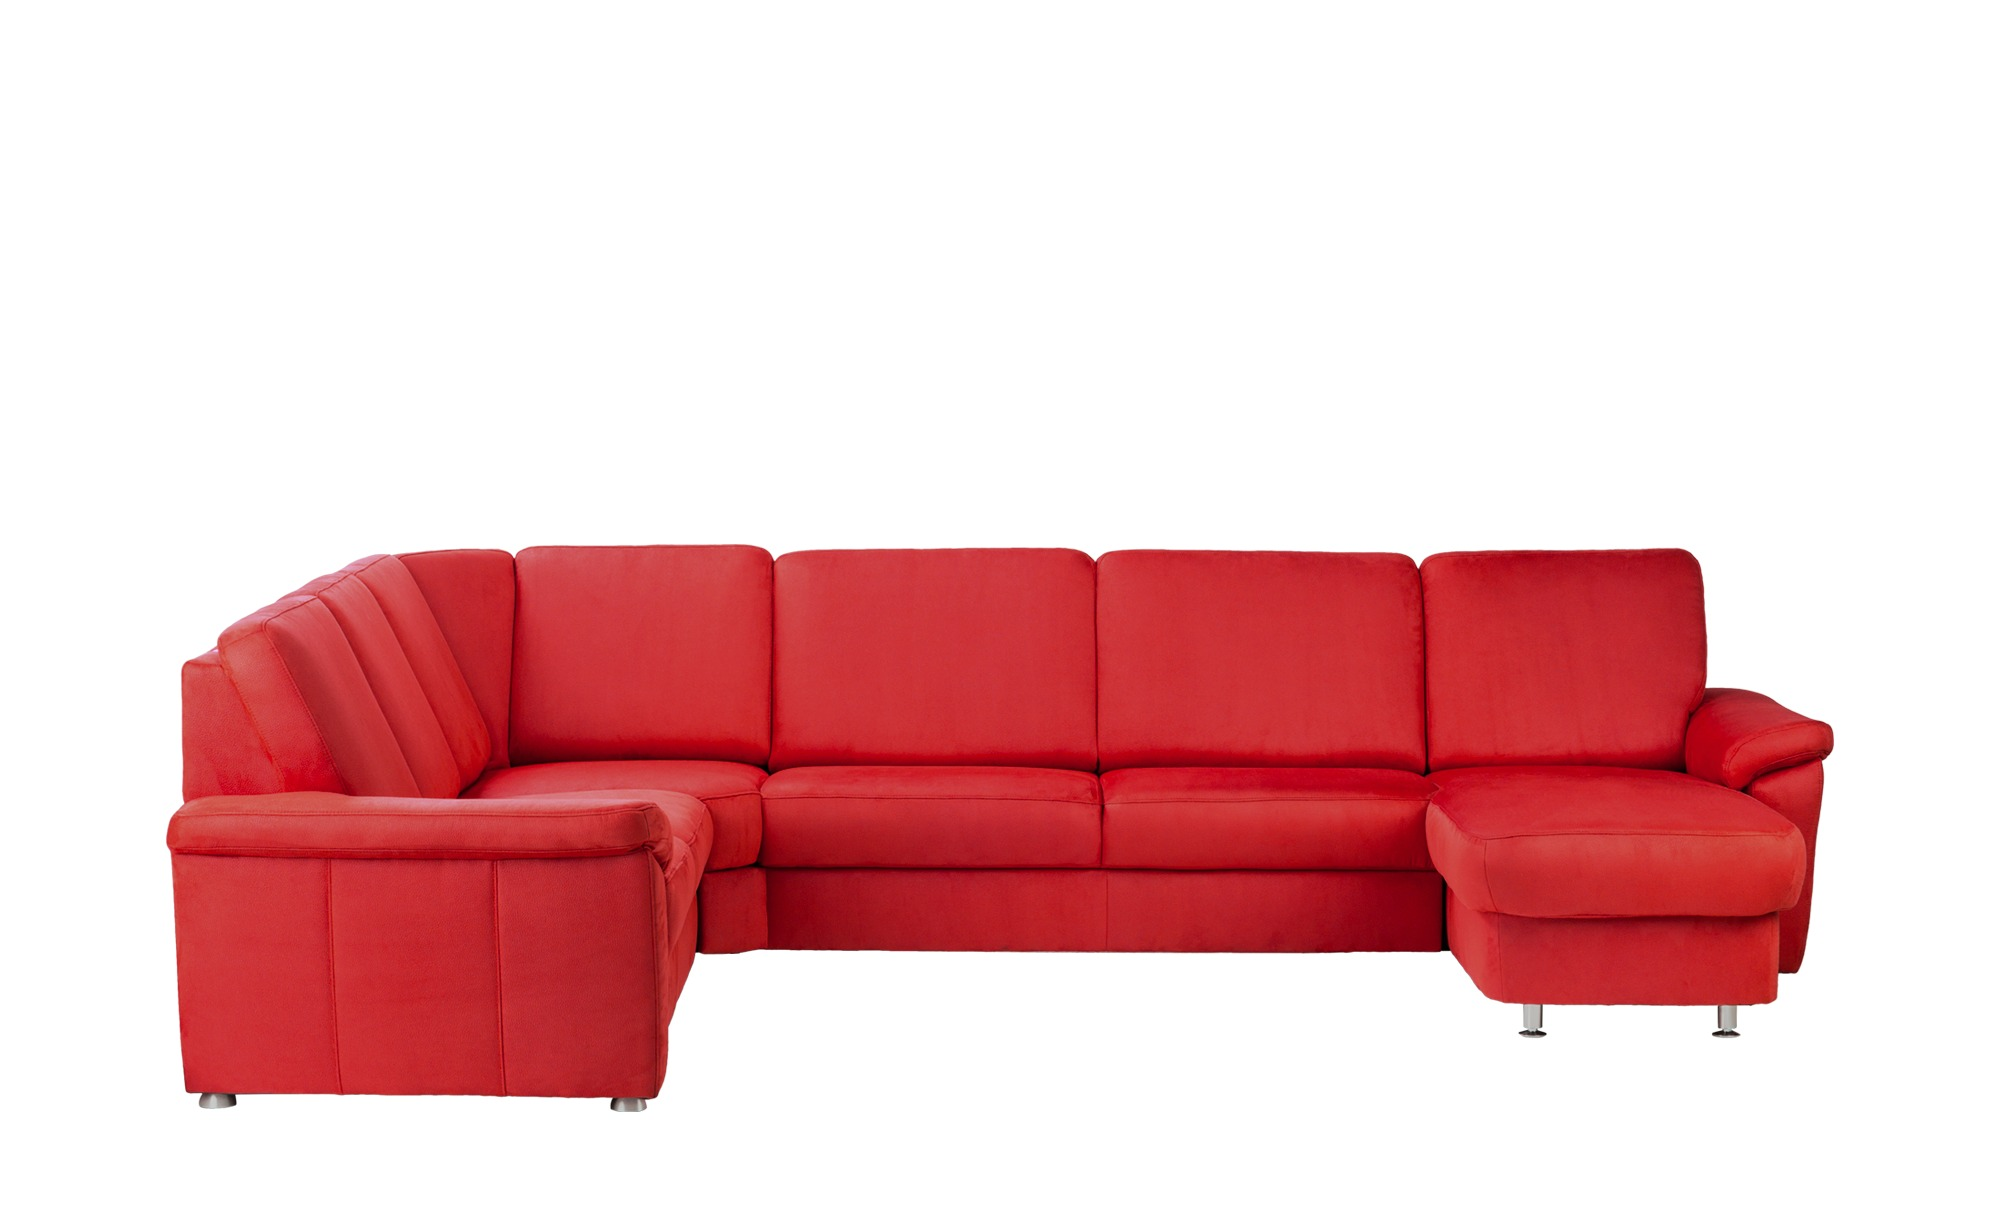 Full Size of Rotes Sofa Wohnlandschaft Rot Mikrofaser Rita Big Kaufen 3er Natura Hocker Mit Bettfunktion Hersteller Indomo L Form 2 Sitzer Schlaffunktion Goodlife Boxspring Sofa Rotes Sofa